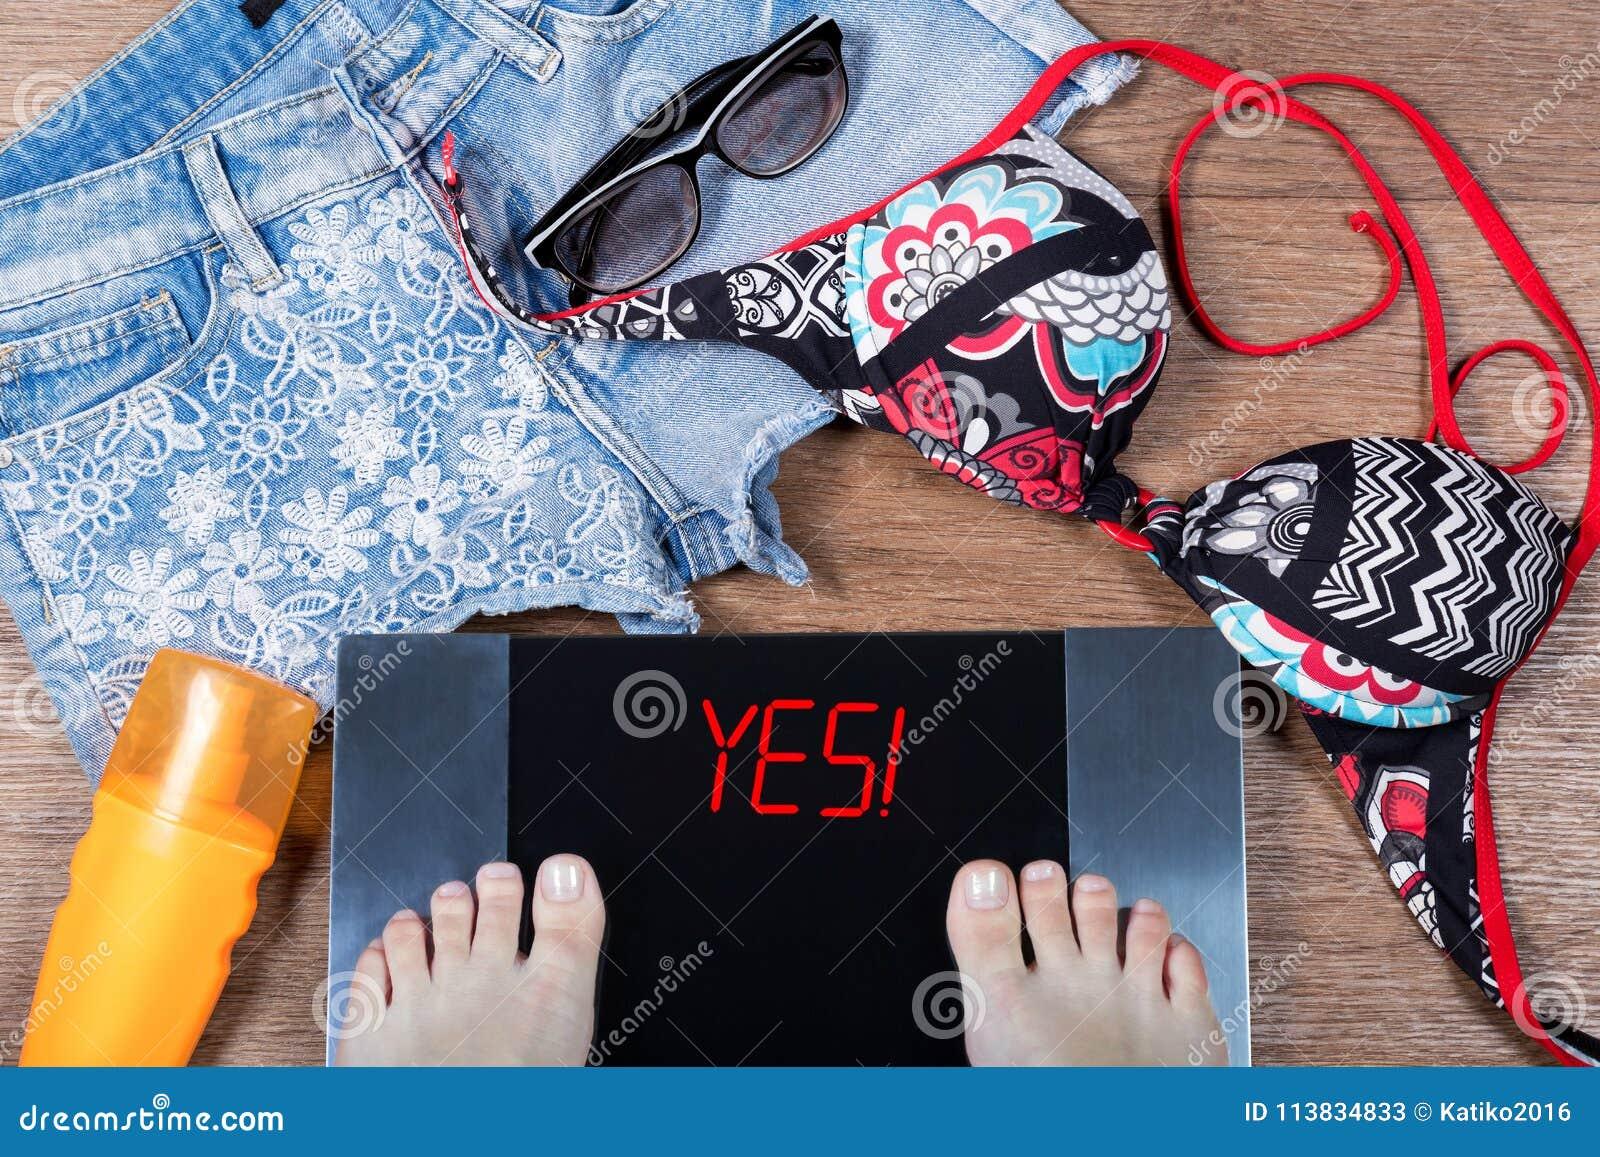 Женщина утяжеляет перед летними каникулами Слово да! на цифровых масштабах concept healthy lifestyle